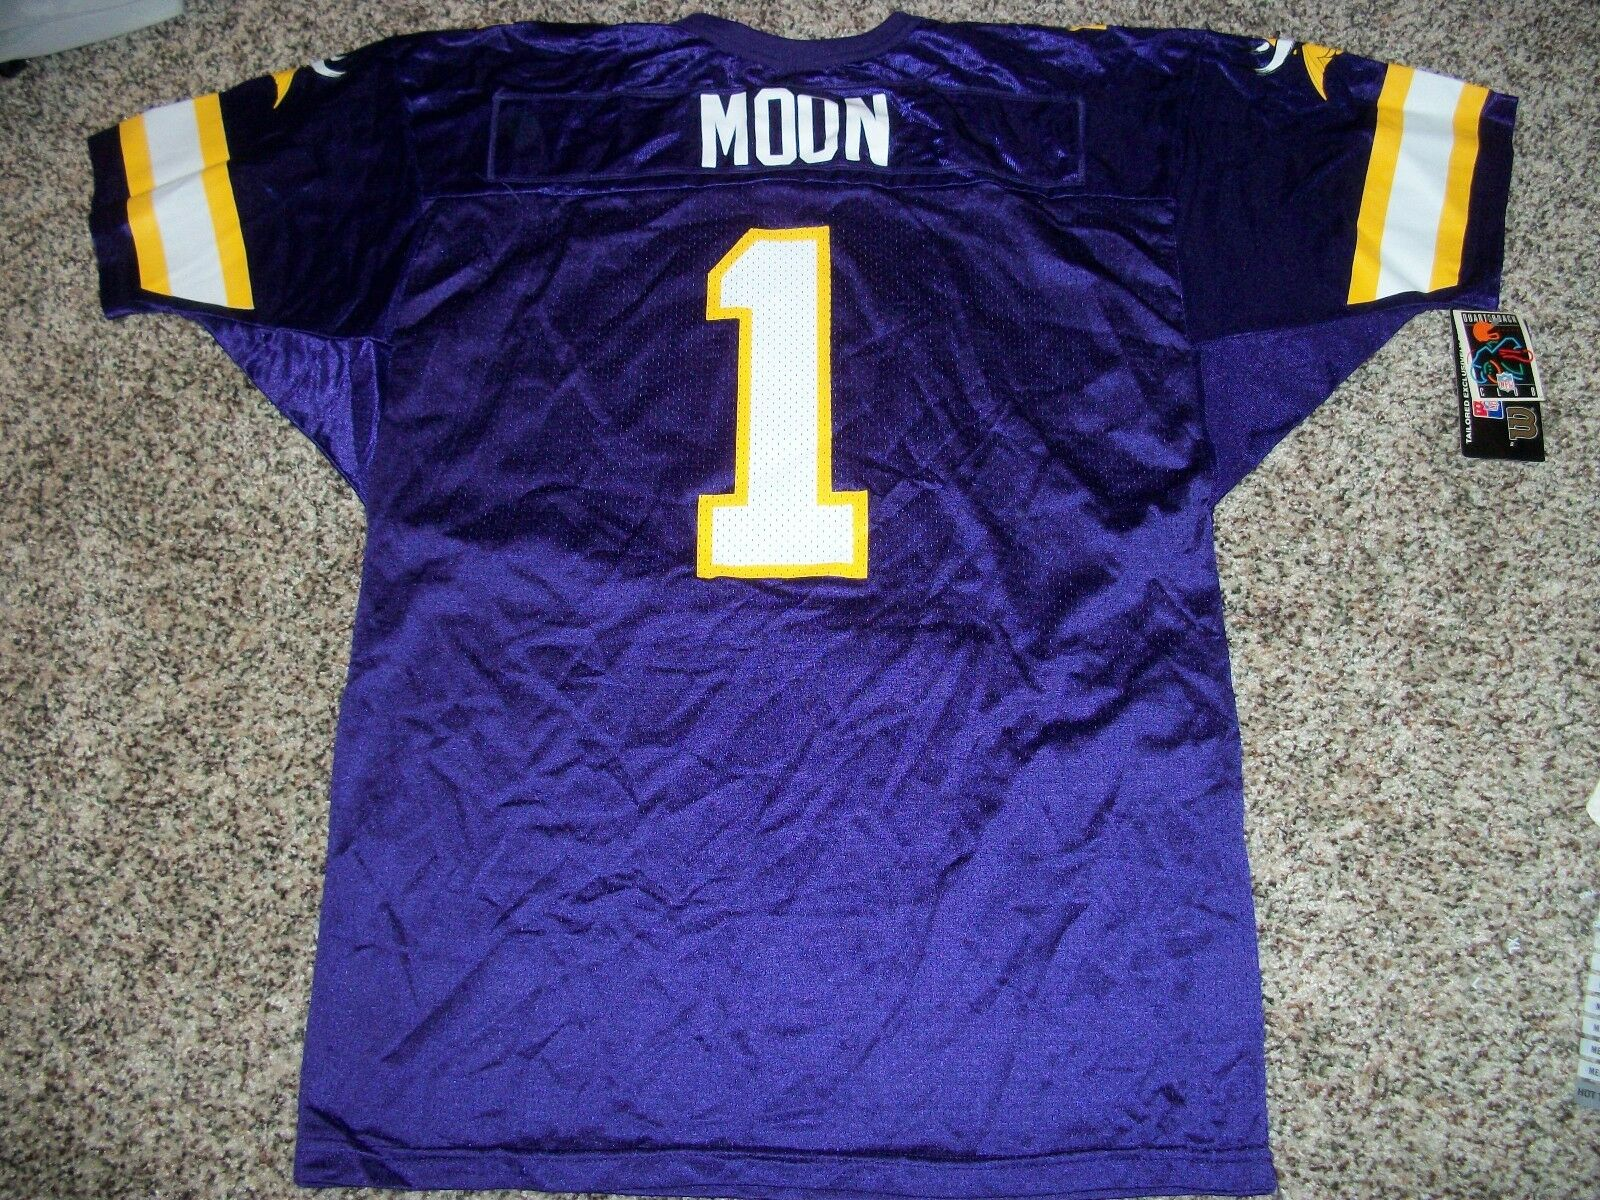 WARREN MOON New NWT Jersey Vintage Wilson Minnesota Vikings LARGE